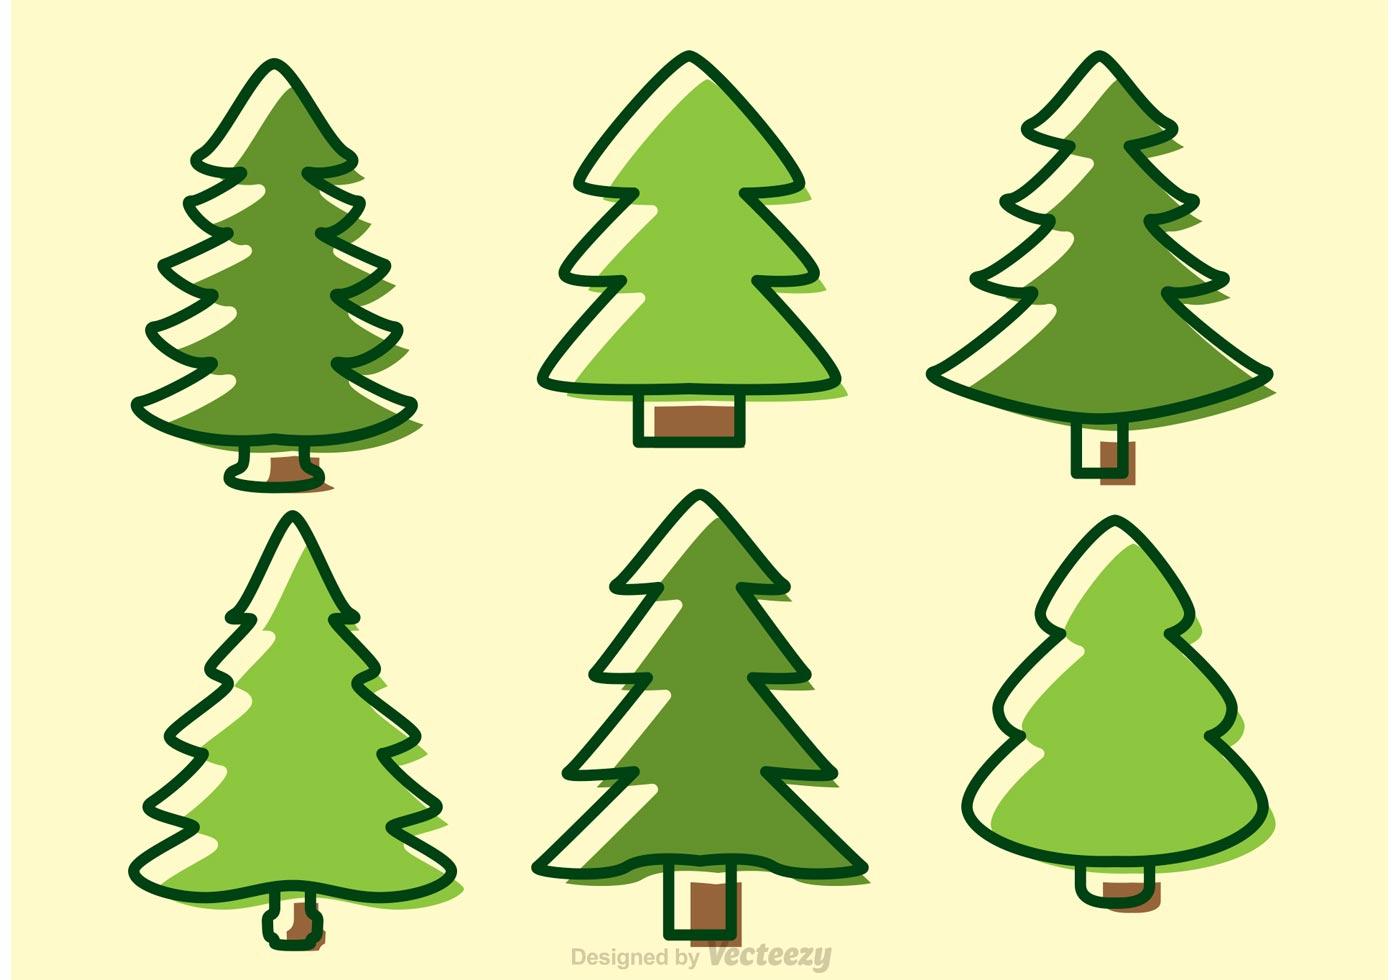 cedar trees cartoon vectors download free vector art evergreen tree clipart black and white evergreen tree clipart black and white